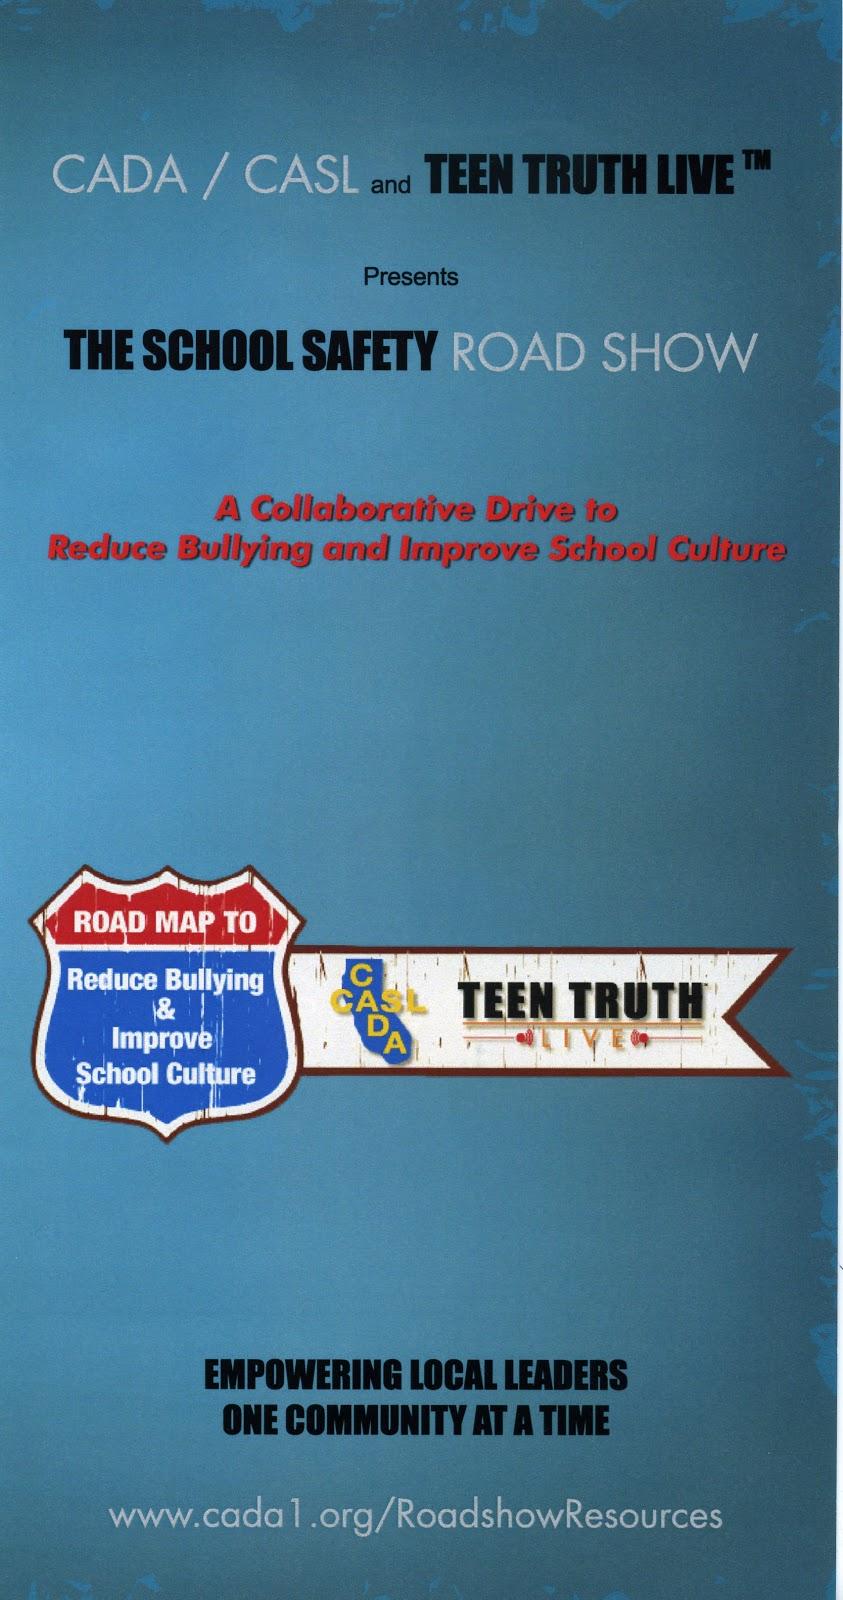 Teen Truth Live 113